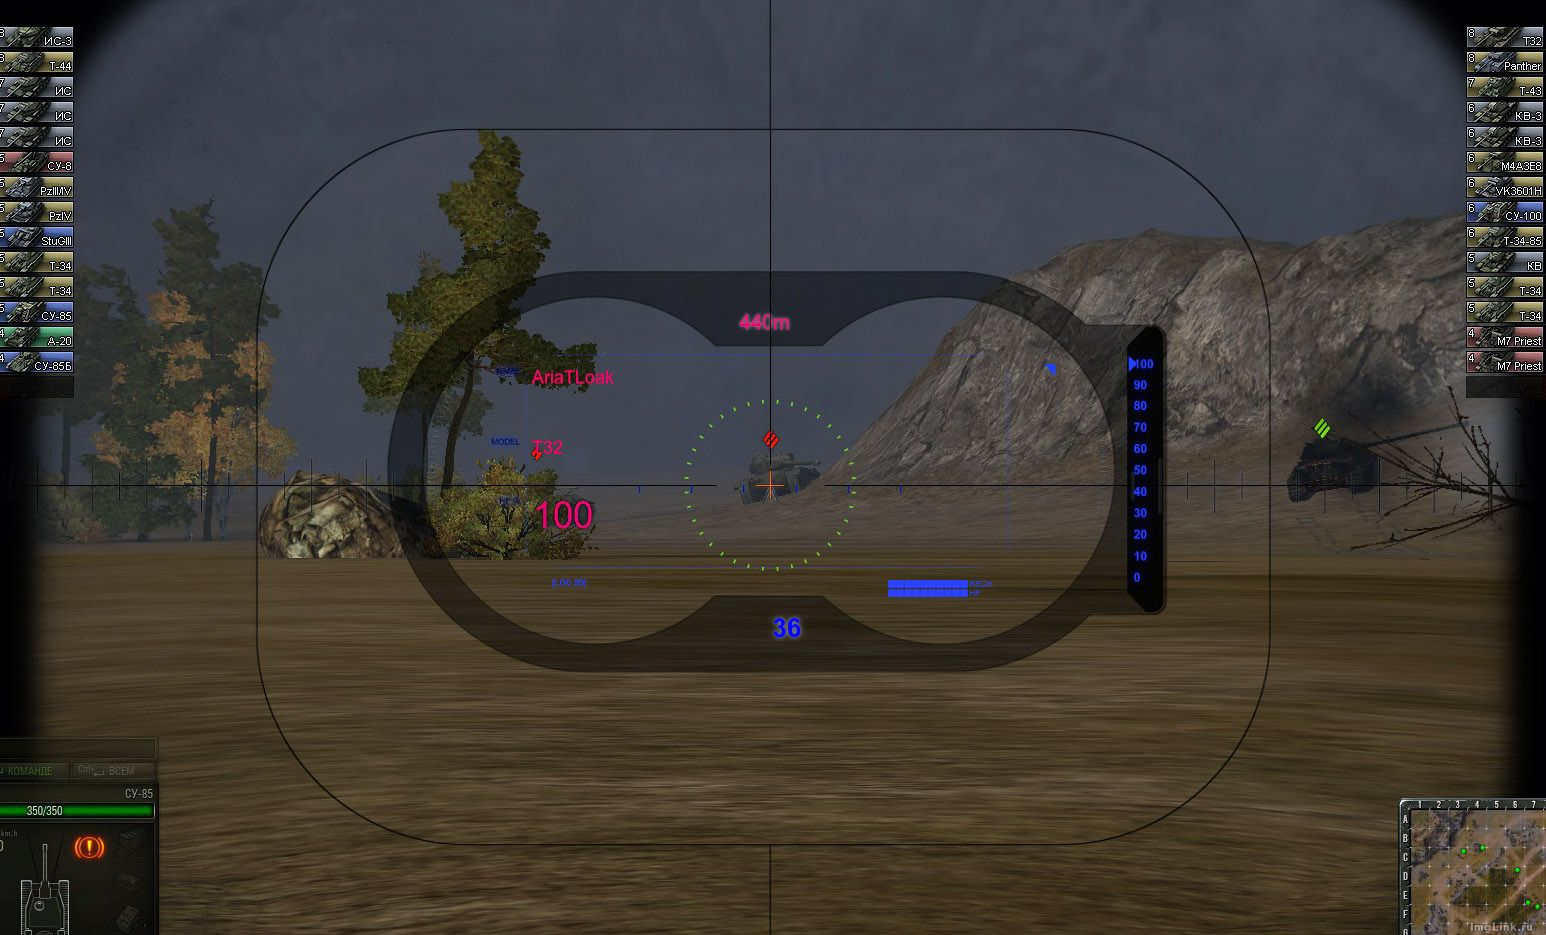 Снайперский прицел от marsoff 5adbd10c7dcd260c26dfb3bd50355a23